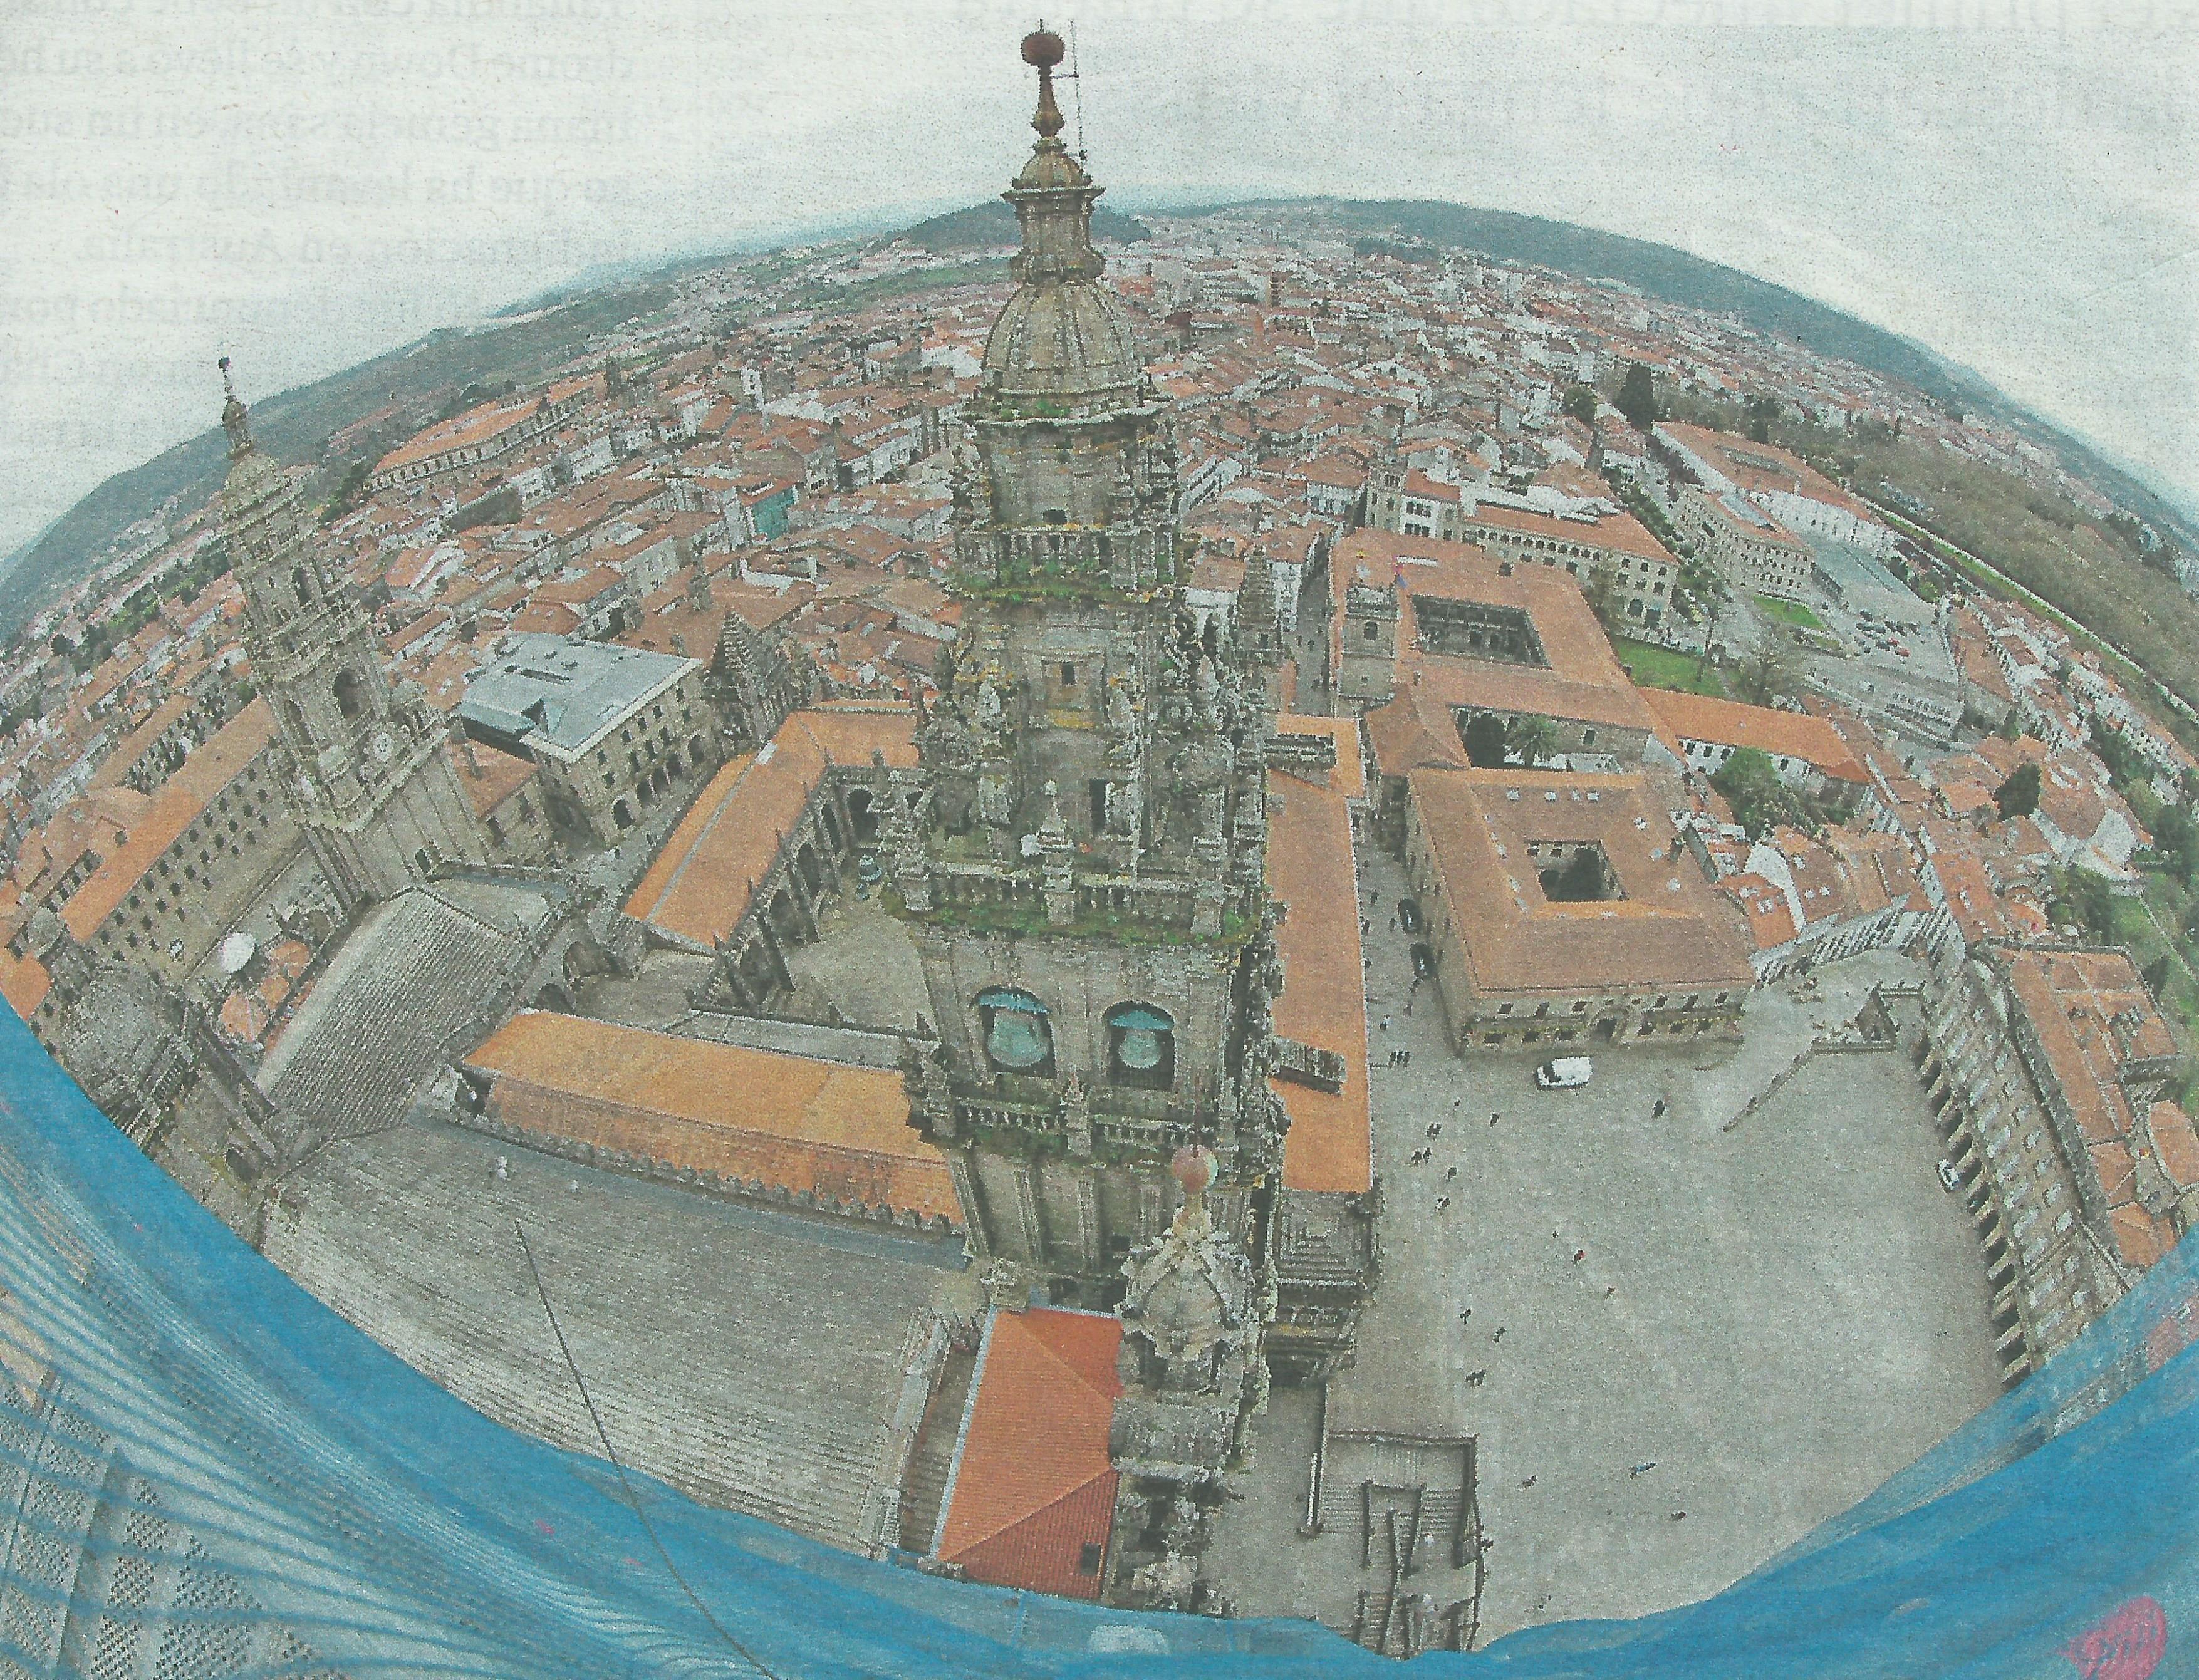 Pin En Fotos De Santiago De Compostela